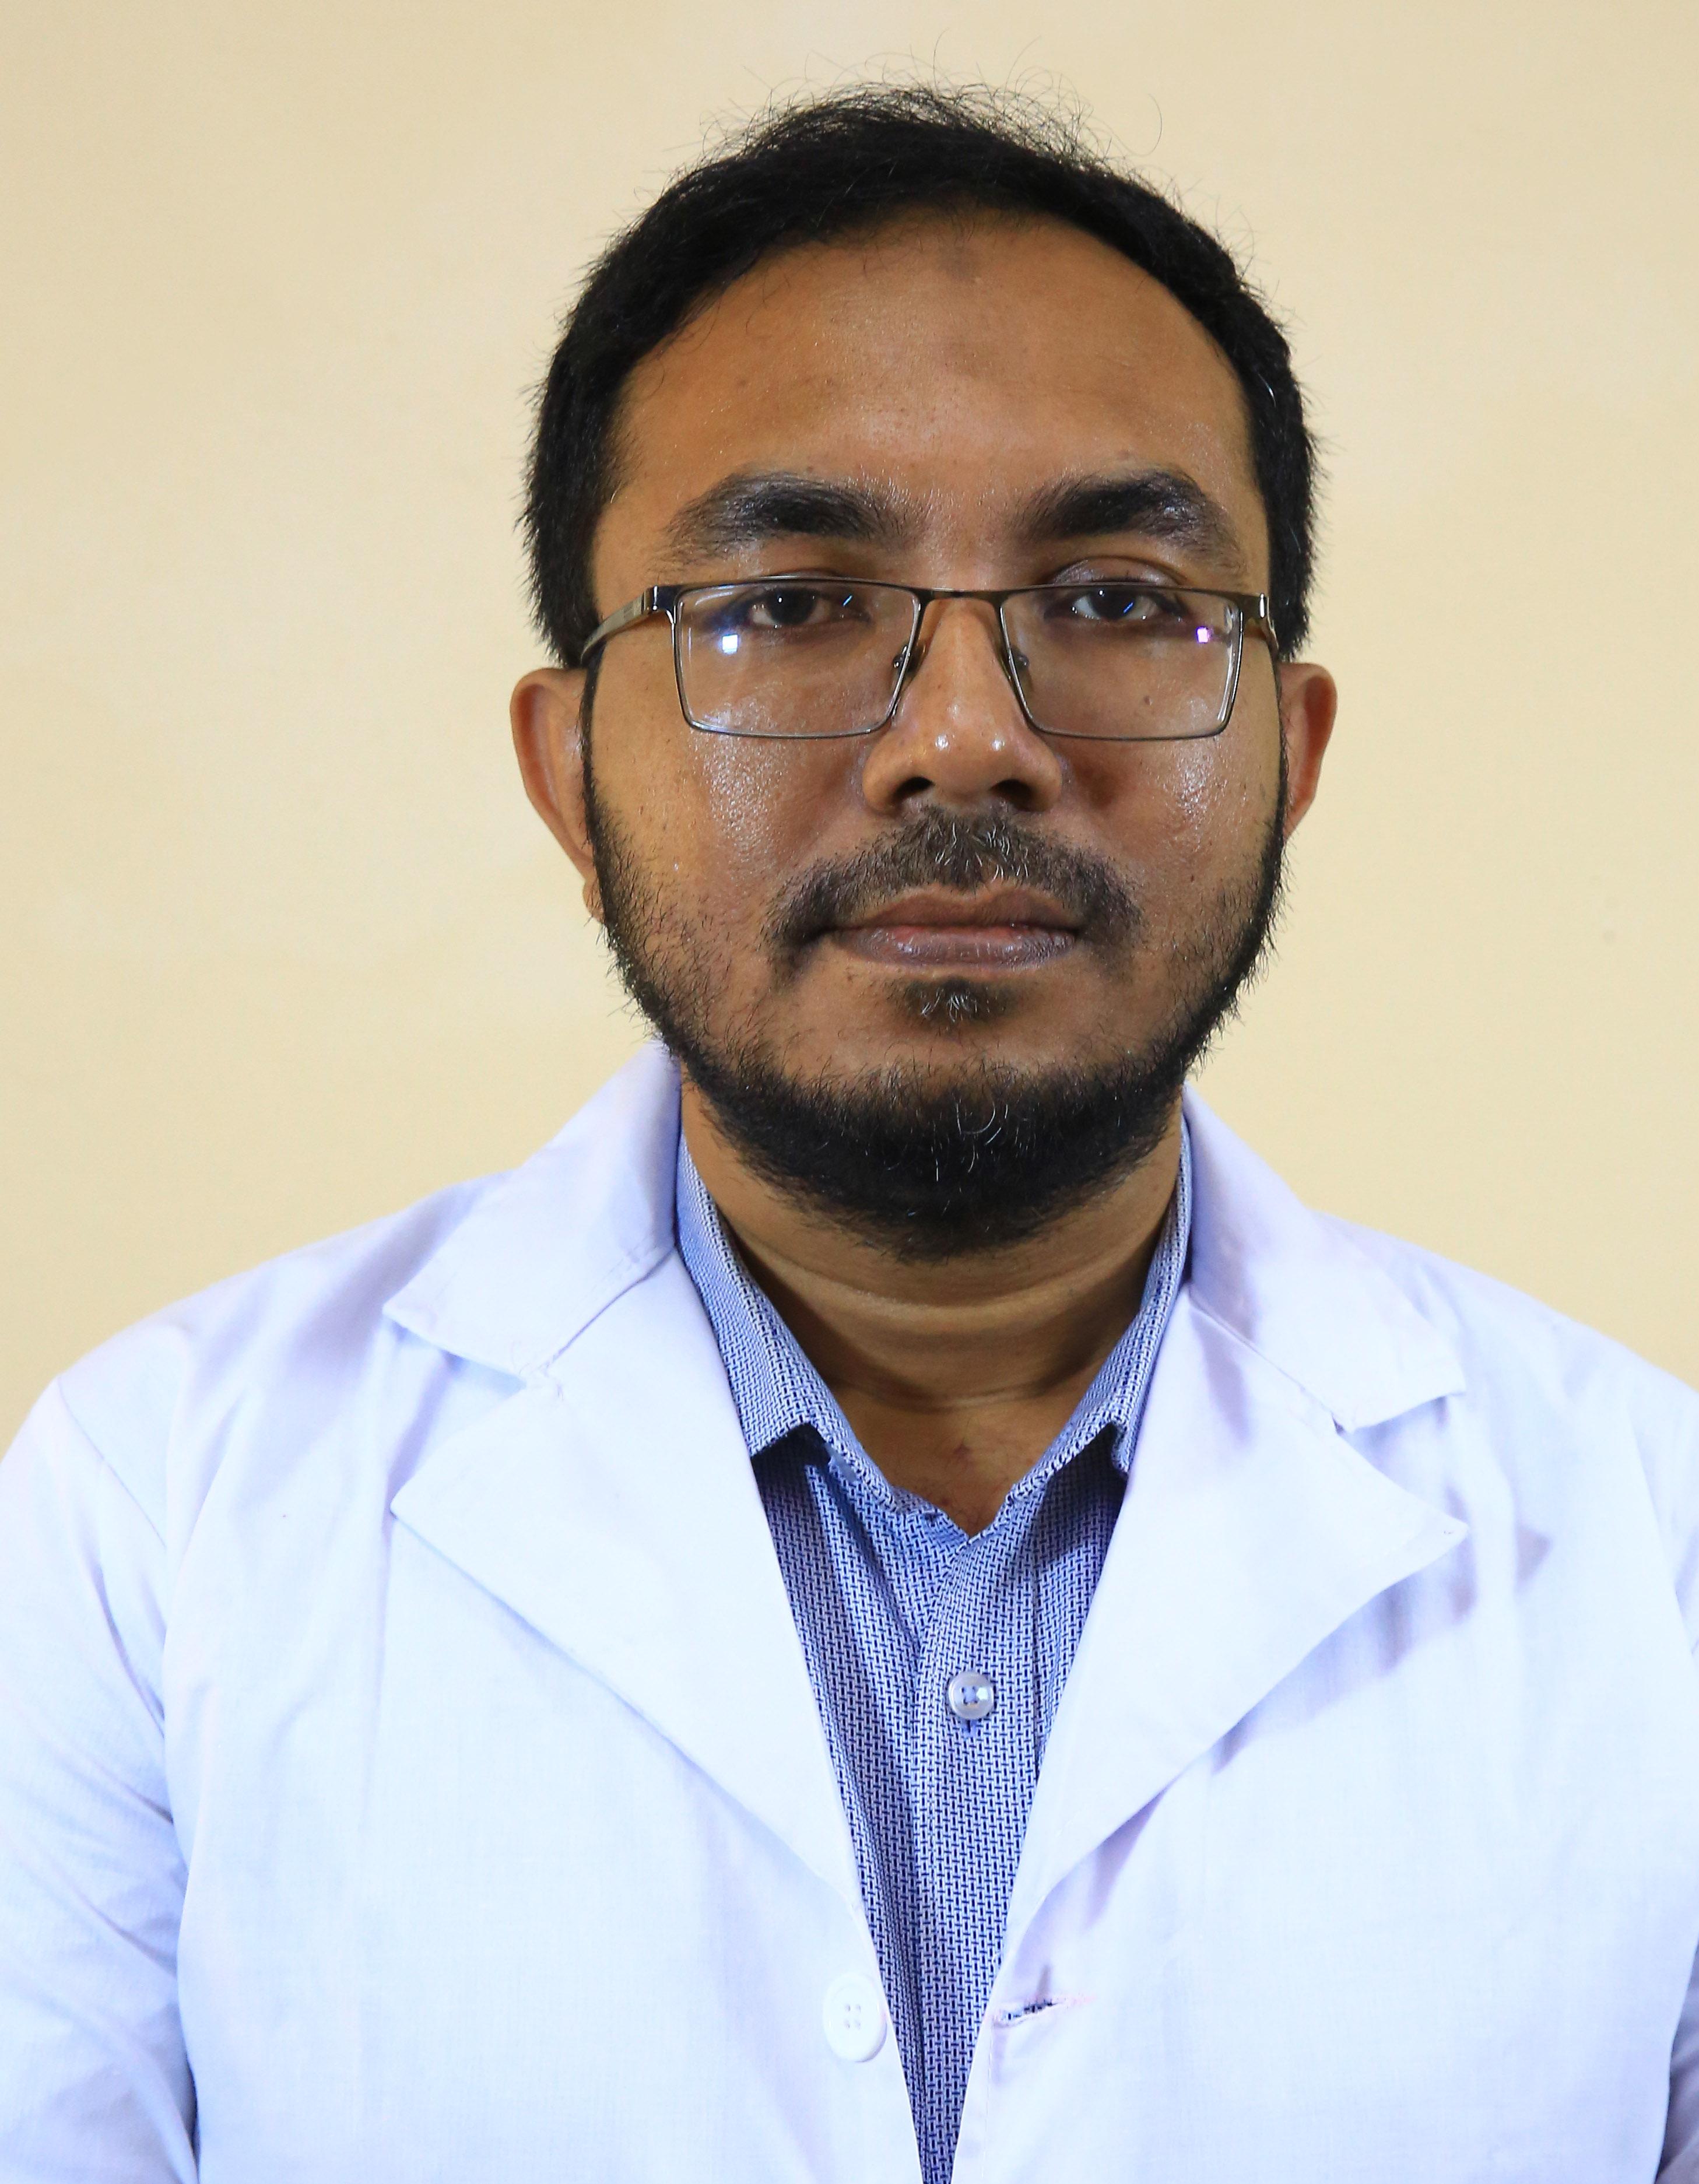 Dr. Khondoker A. B. M. Abdullah Al Hasan